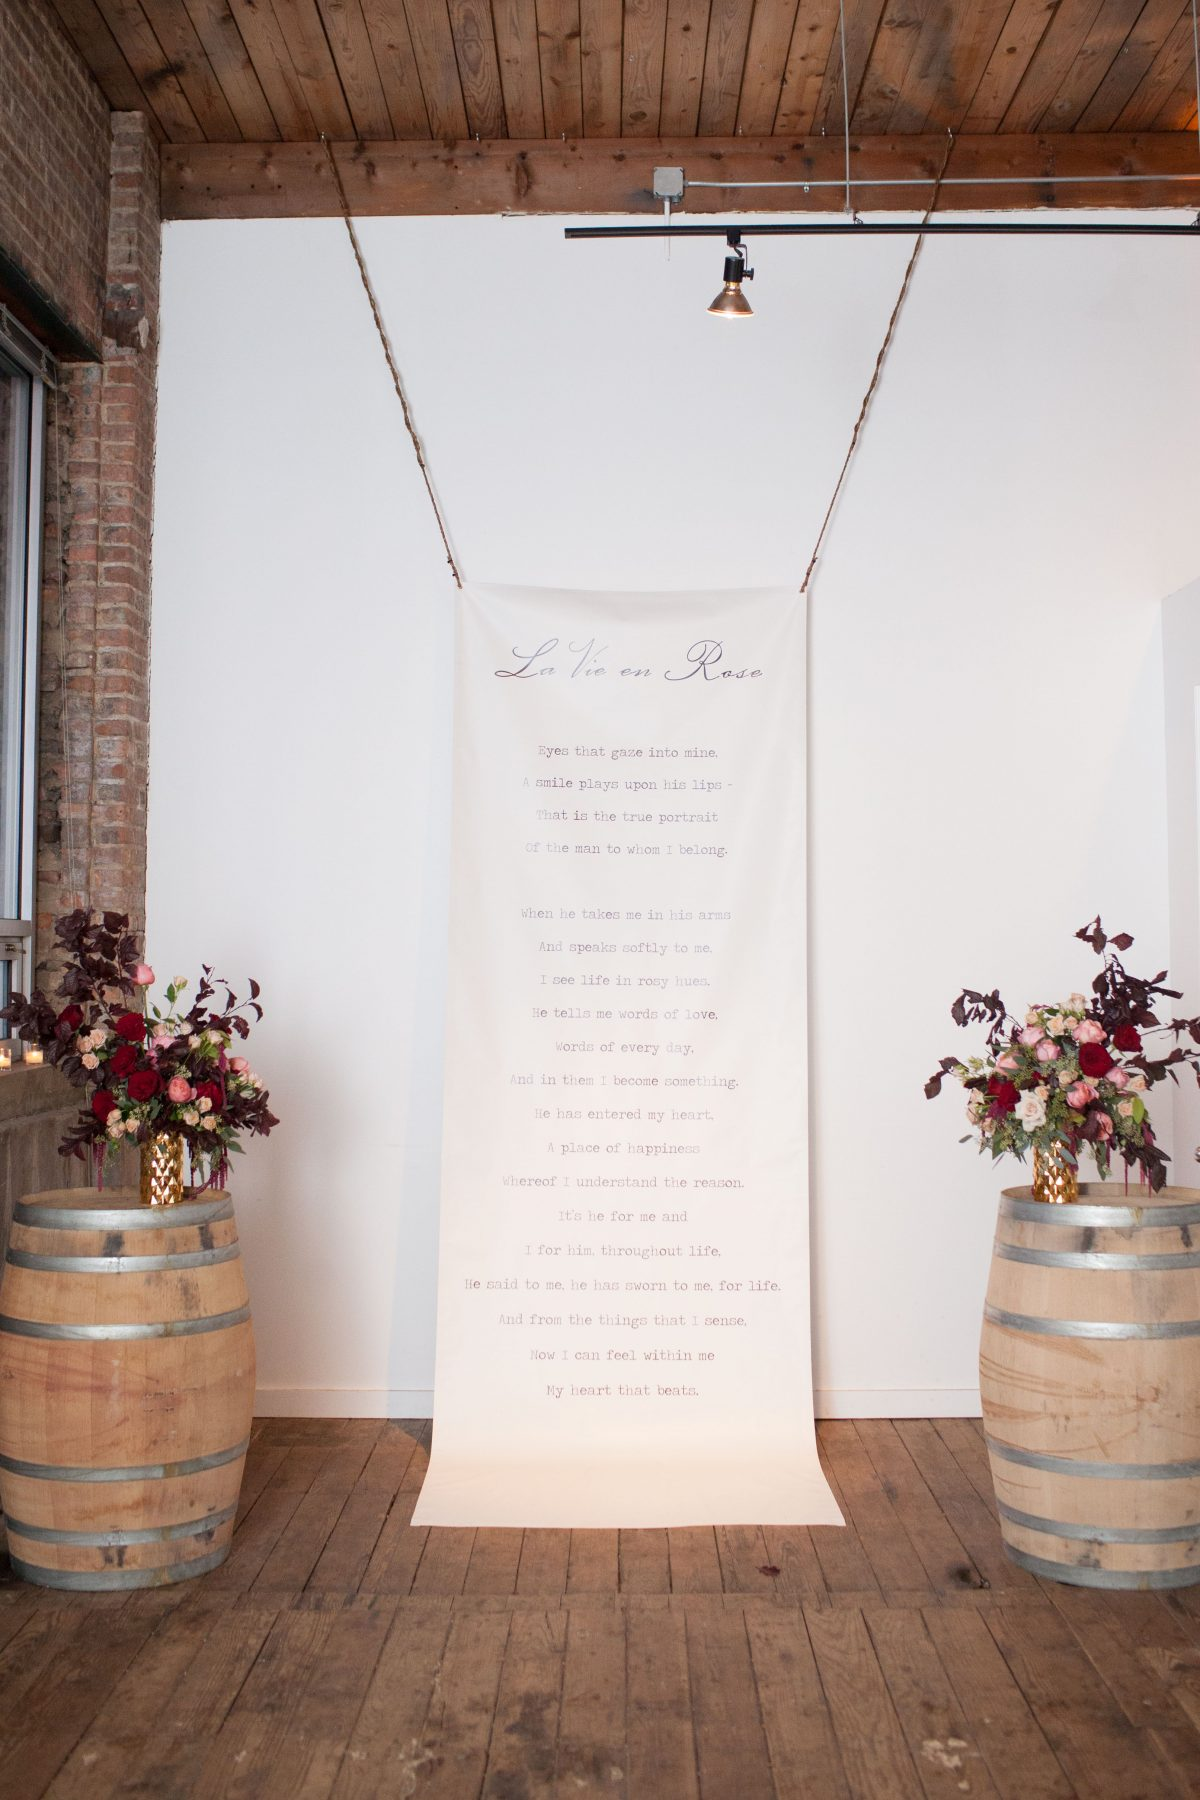 Calligraphy Wedding Ceremony Backdrop